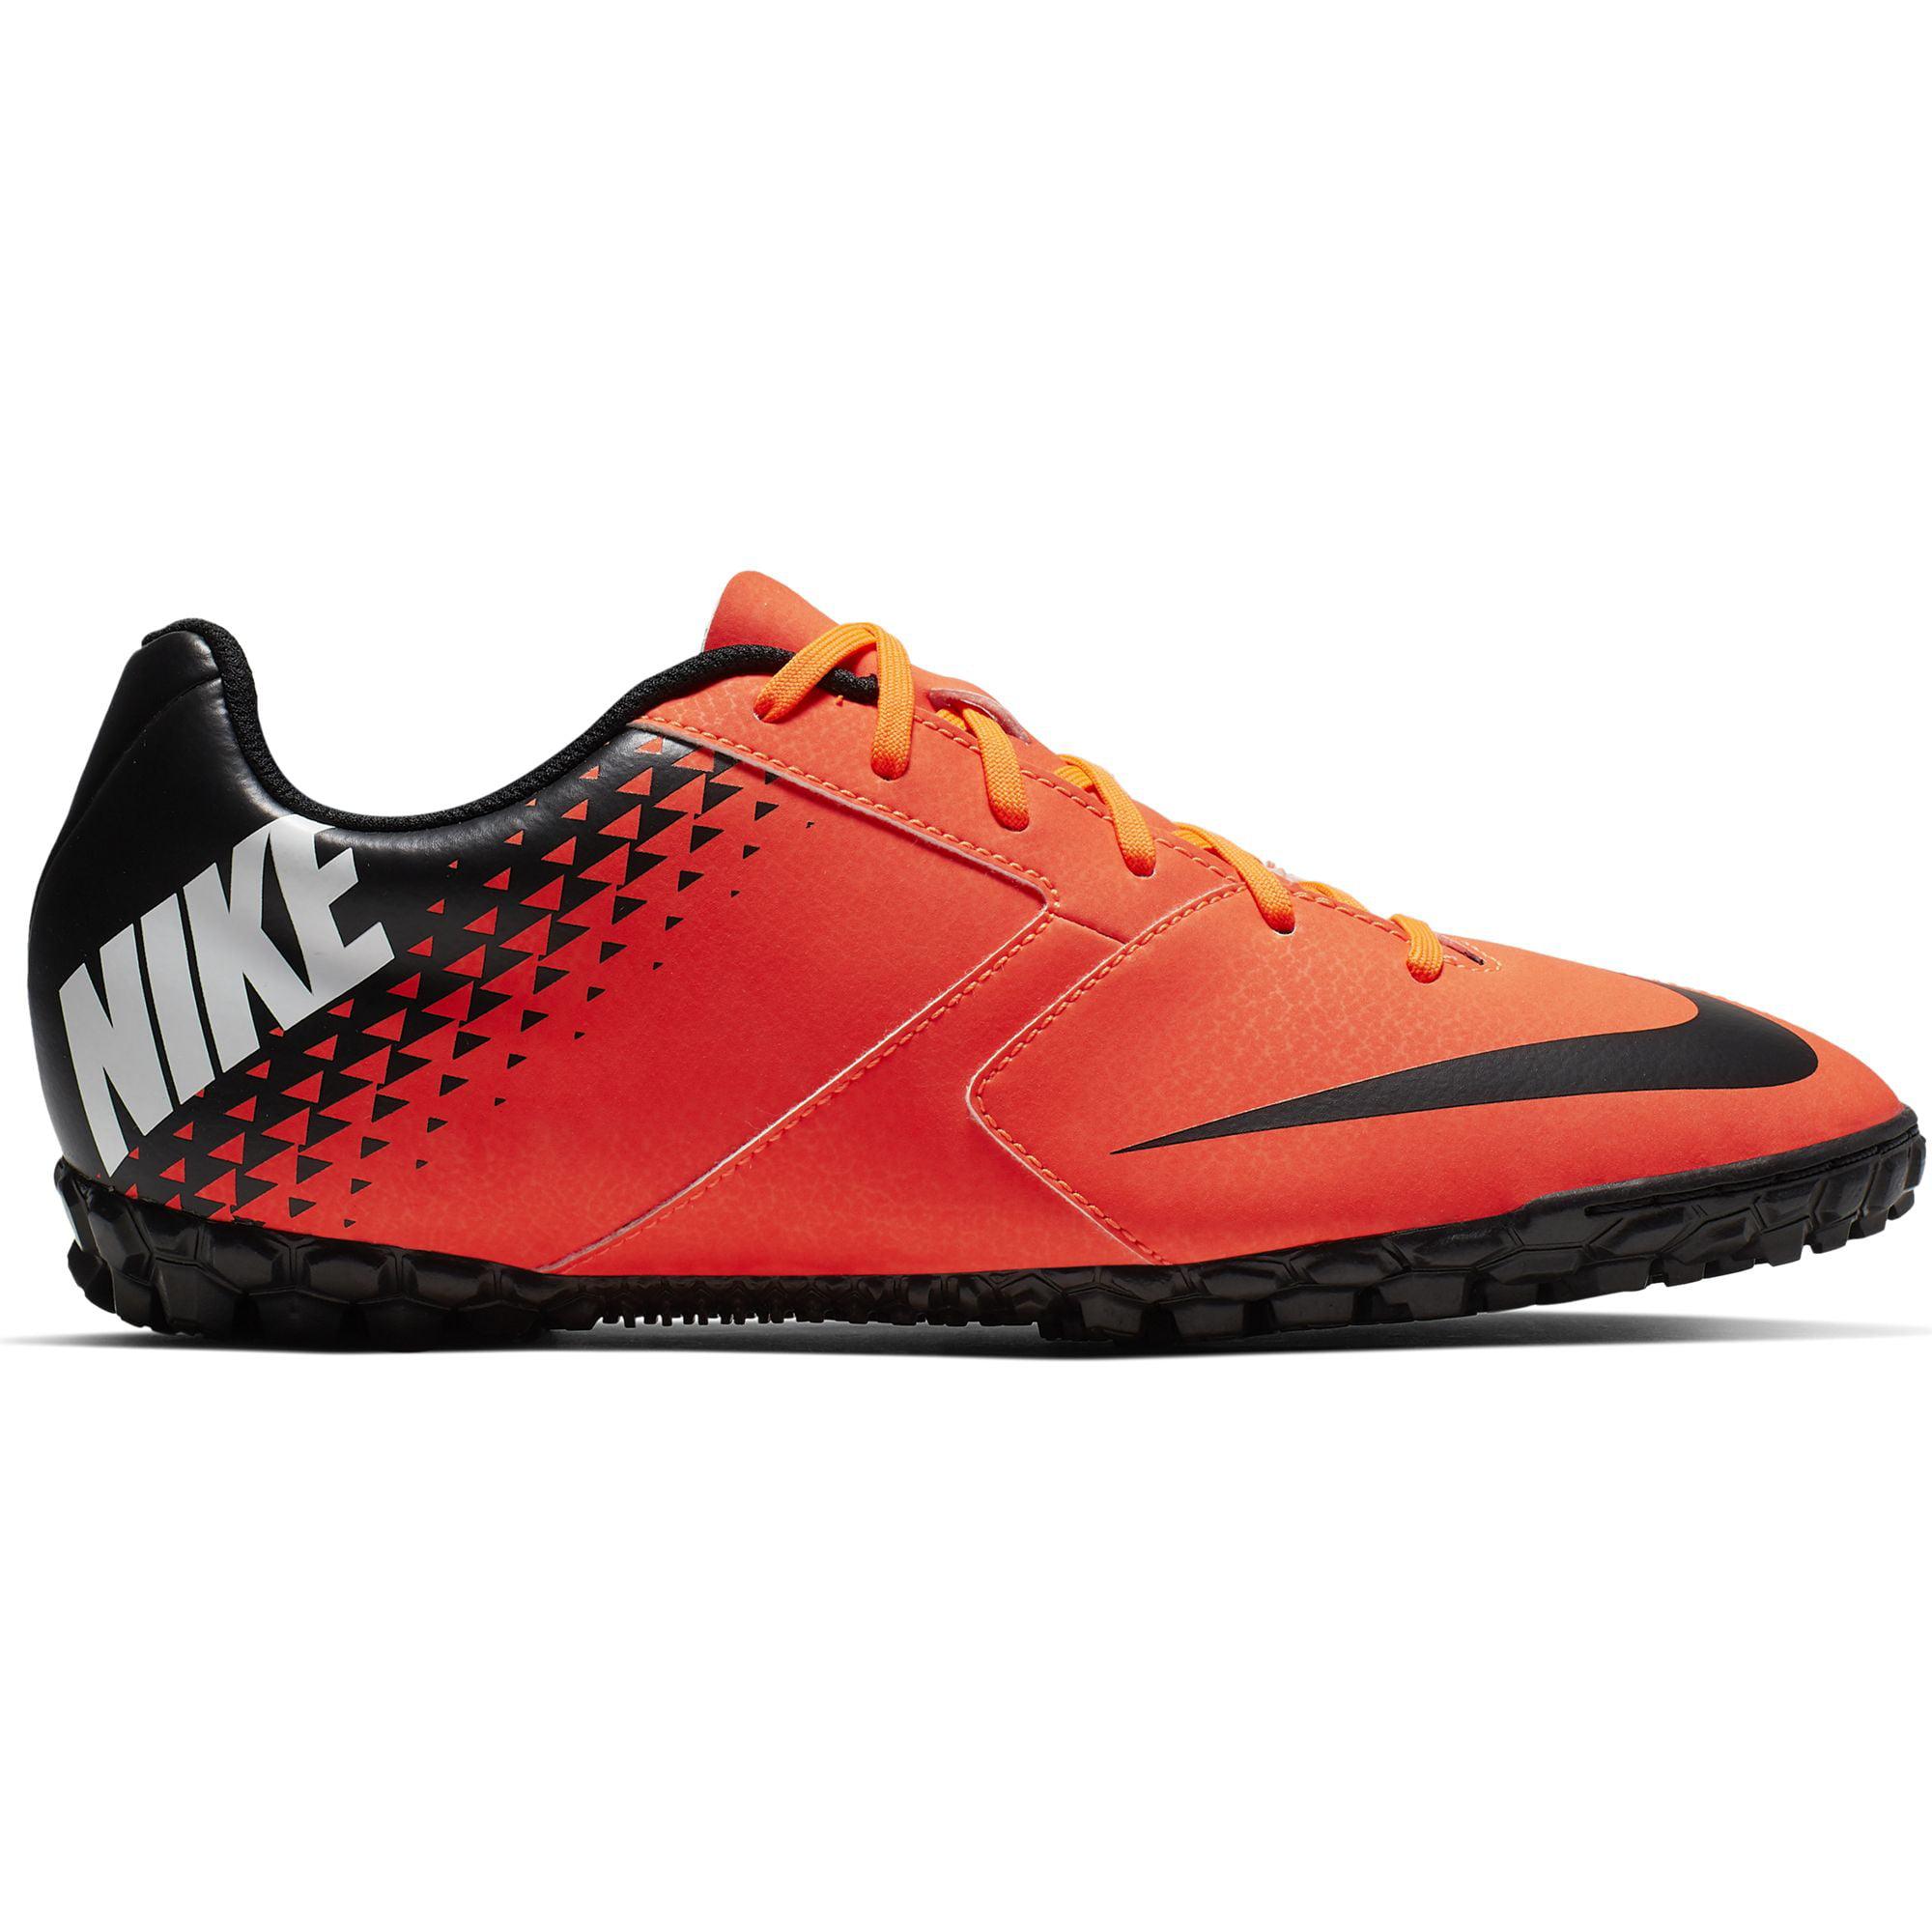 Men's Nike BombaX Turf Soccer Shoe